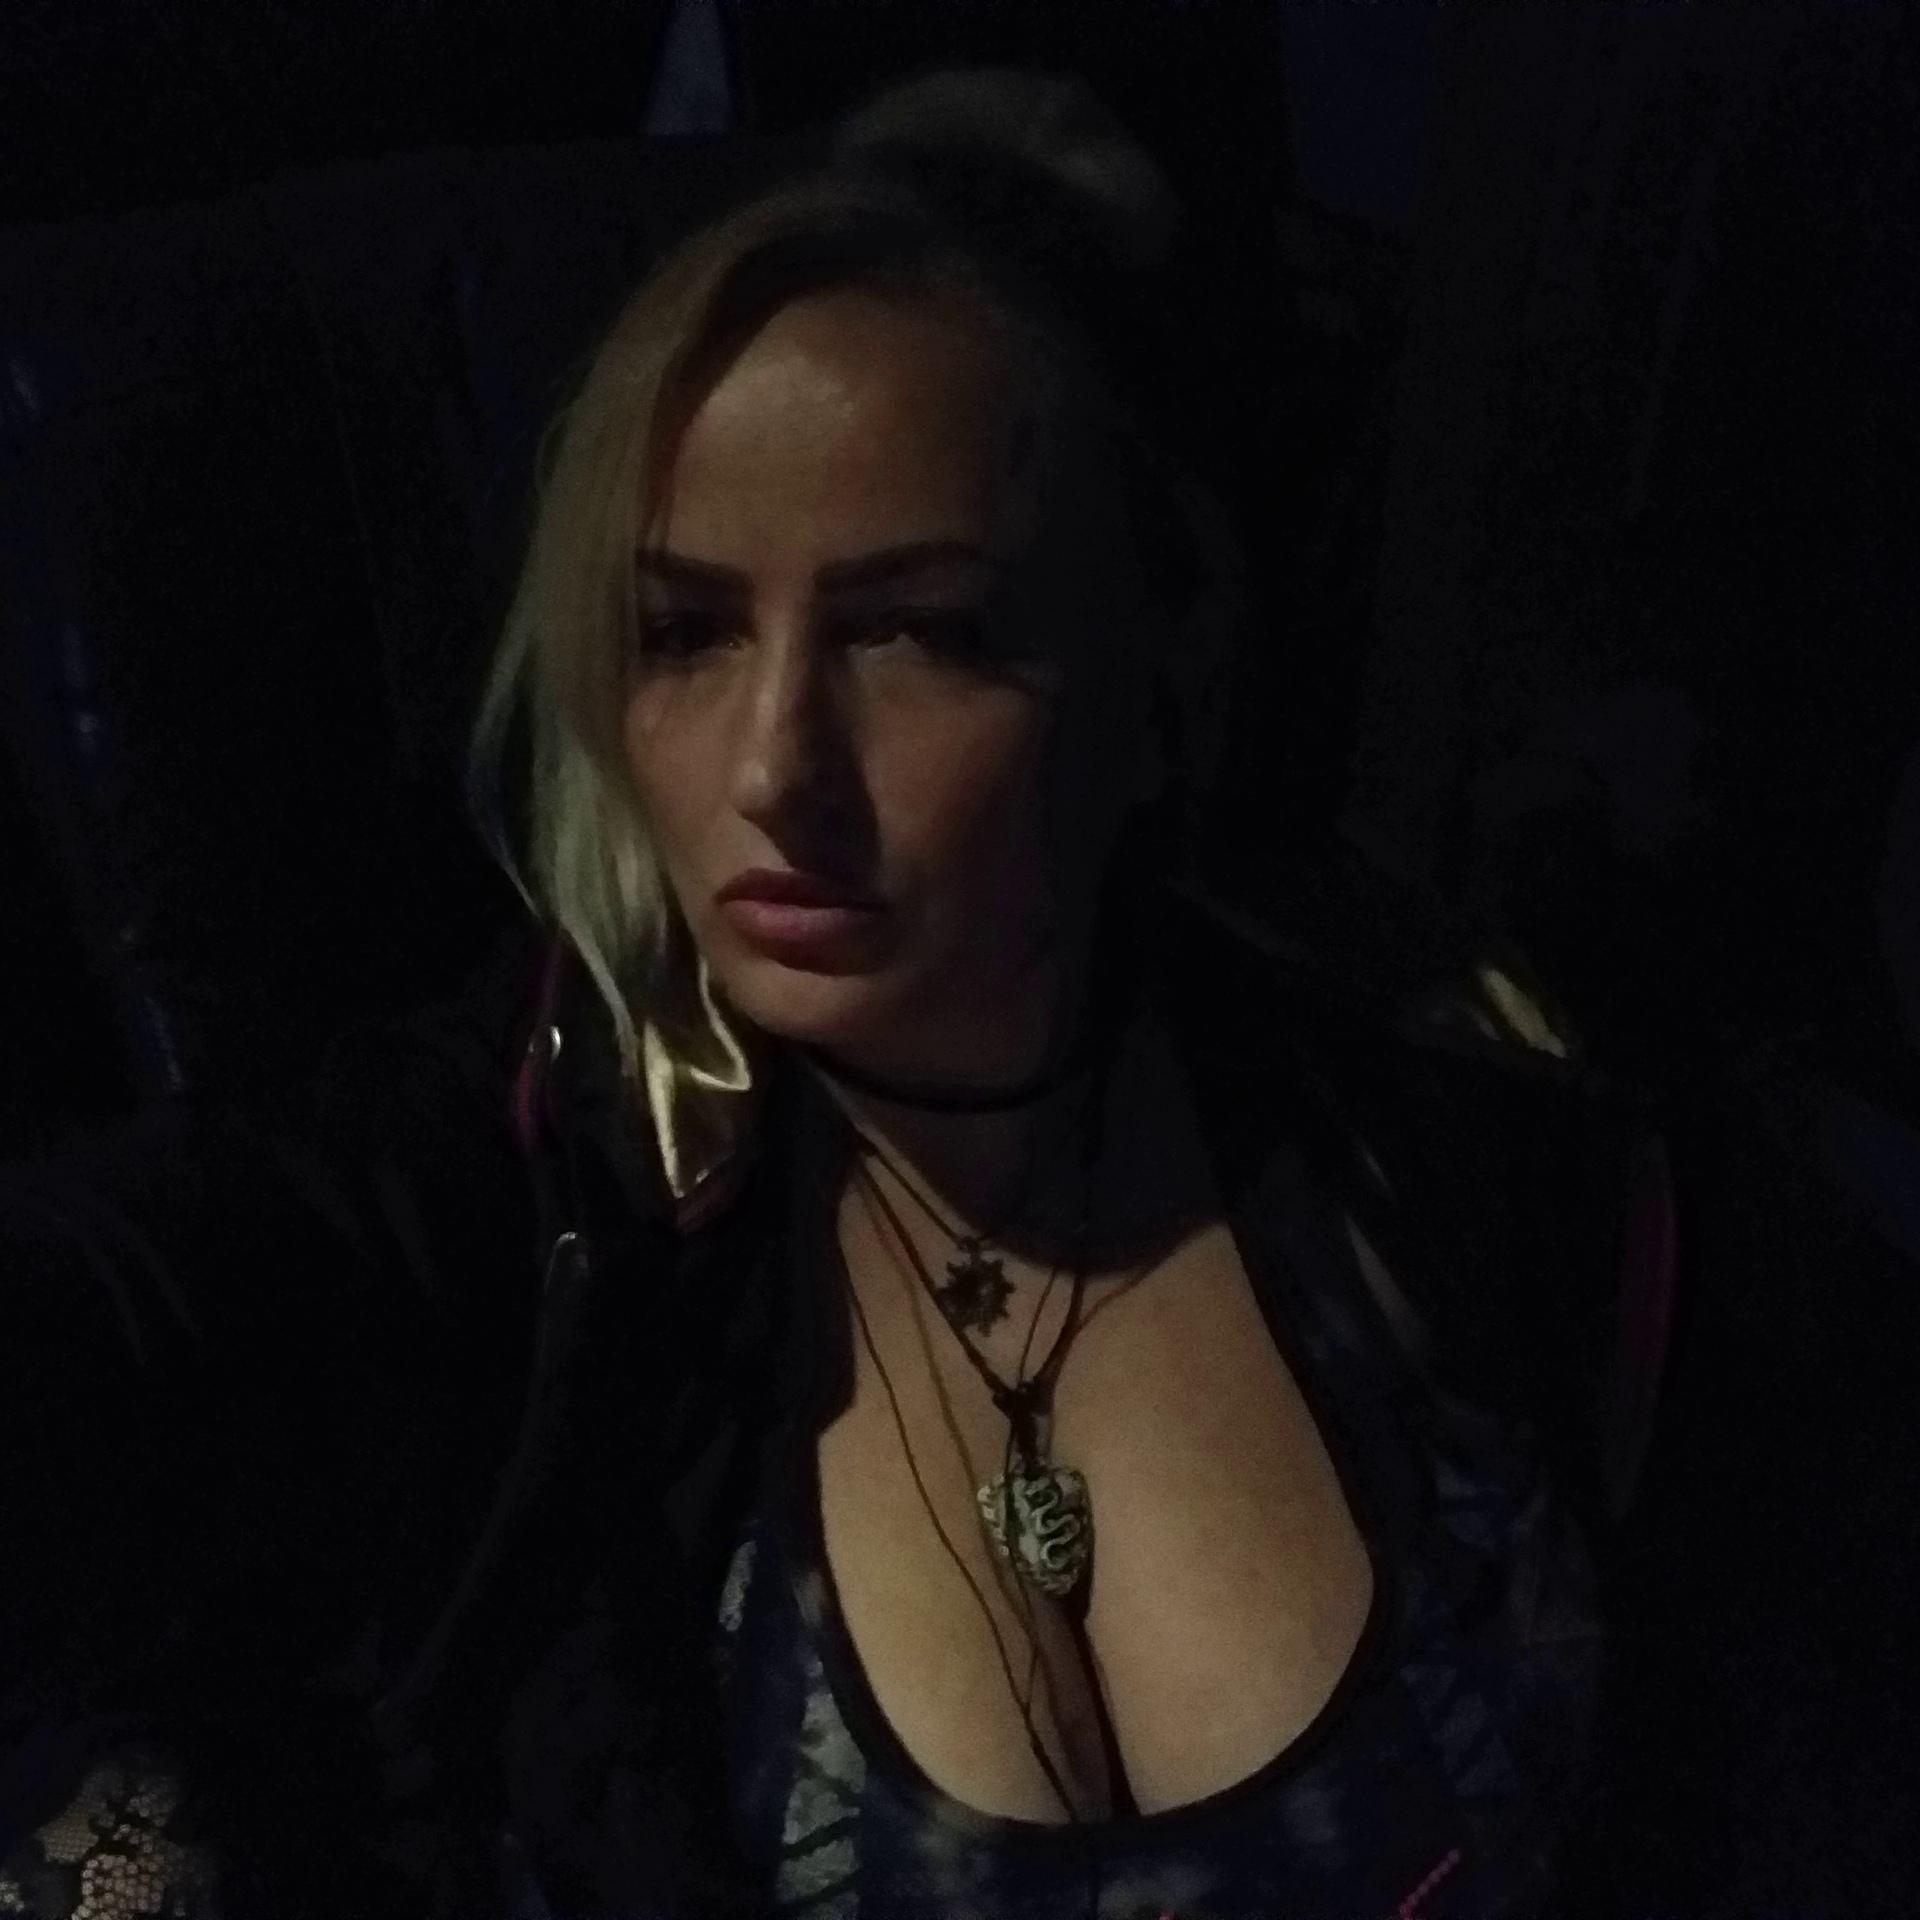 Хештег отворот на   Салон Магии и мистики Елены Руденко ( Валтеи ). Киев ,тел: 0506251562  _Wn-qkWJhK0